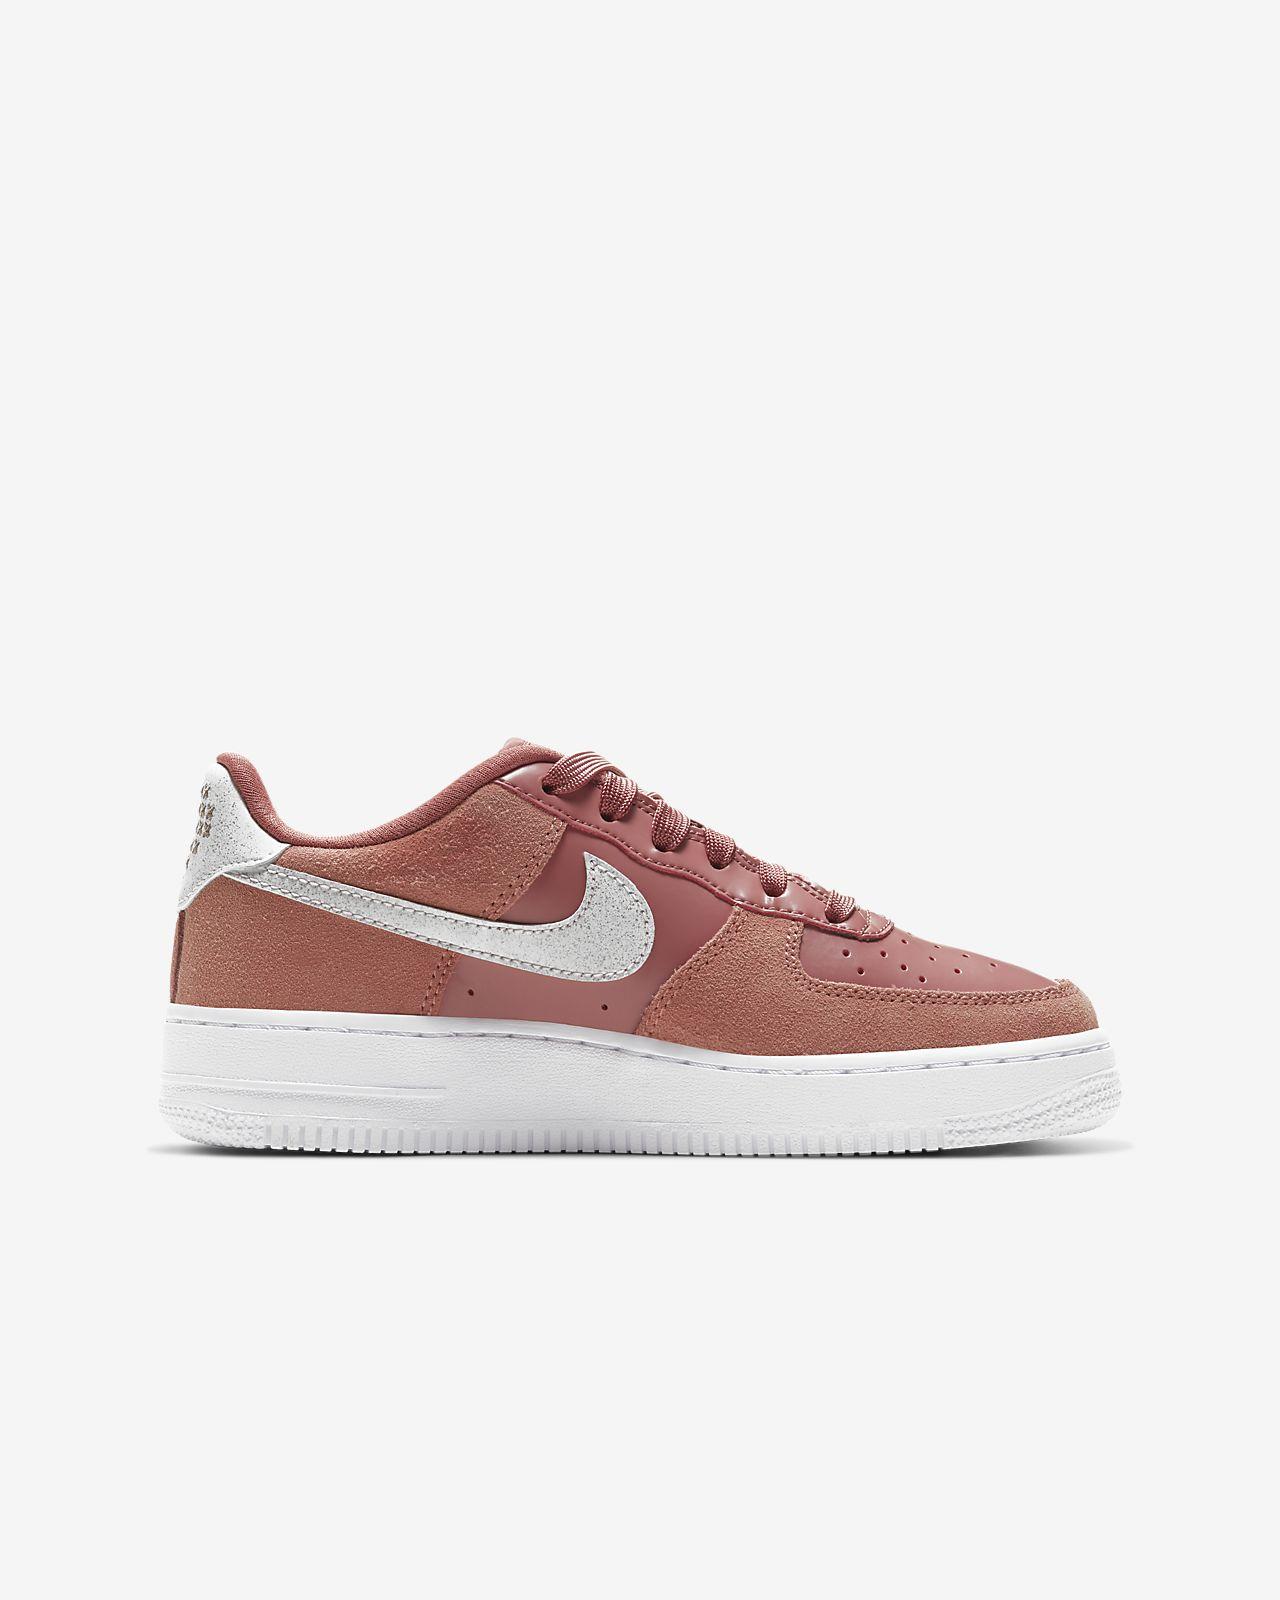 Nike Air Force 1 LV8 Valentine's Day Older Kids' Shoe